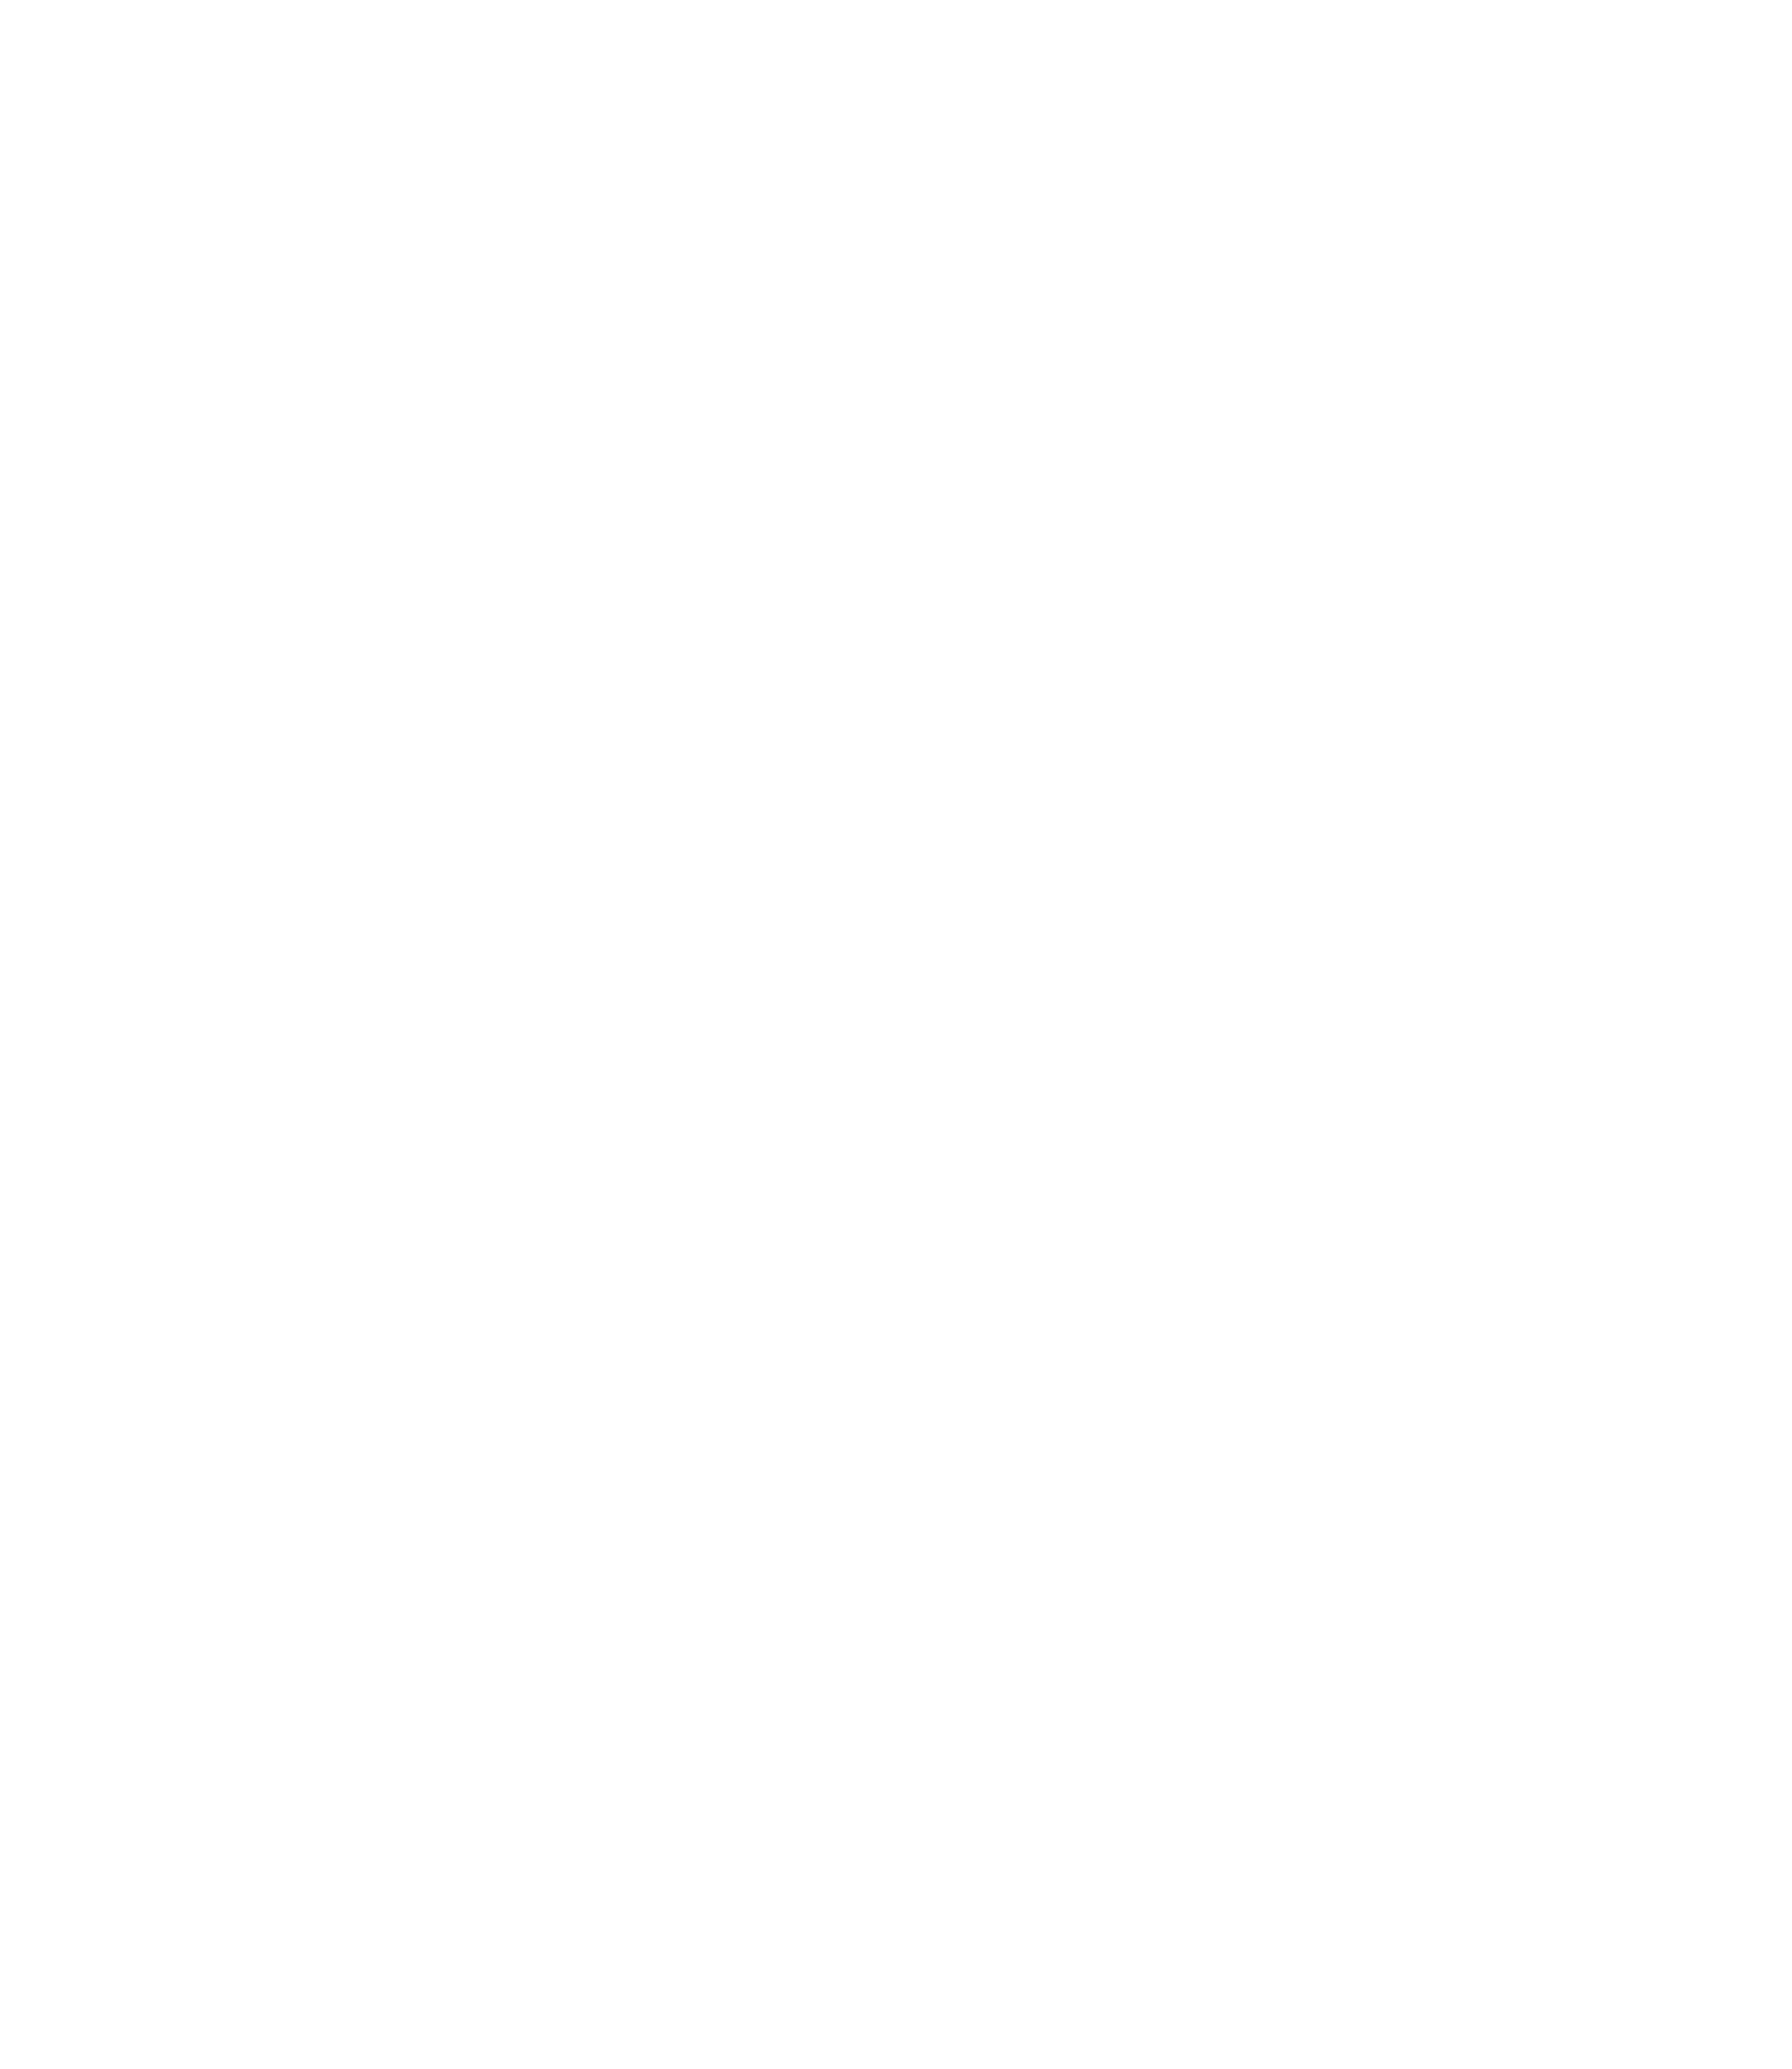 Appical logo beeldmerk negative